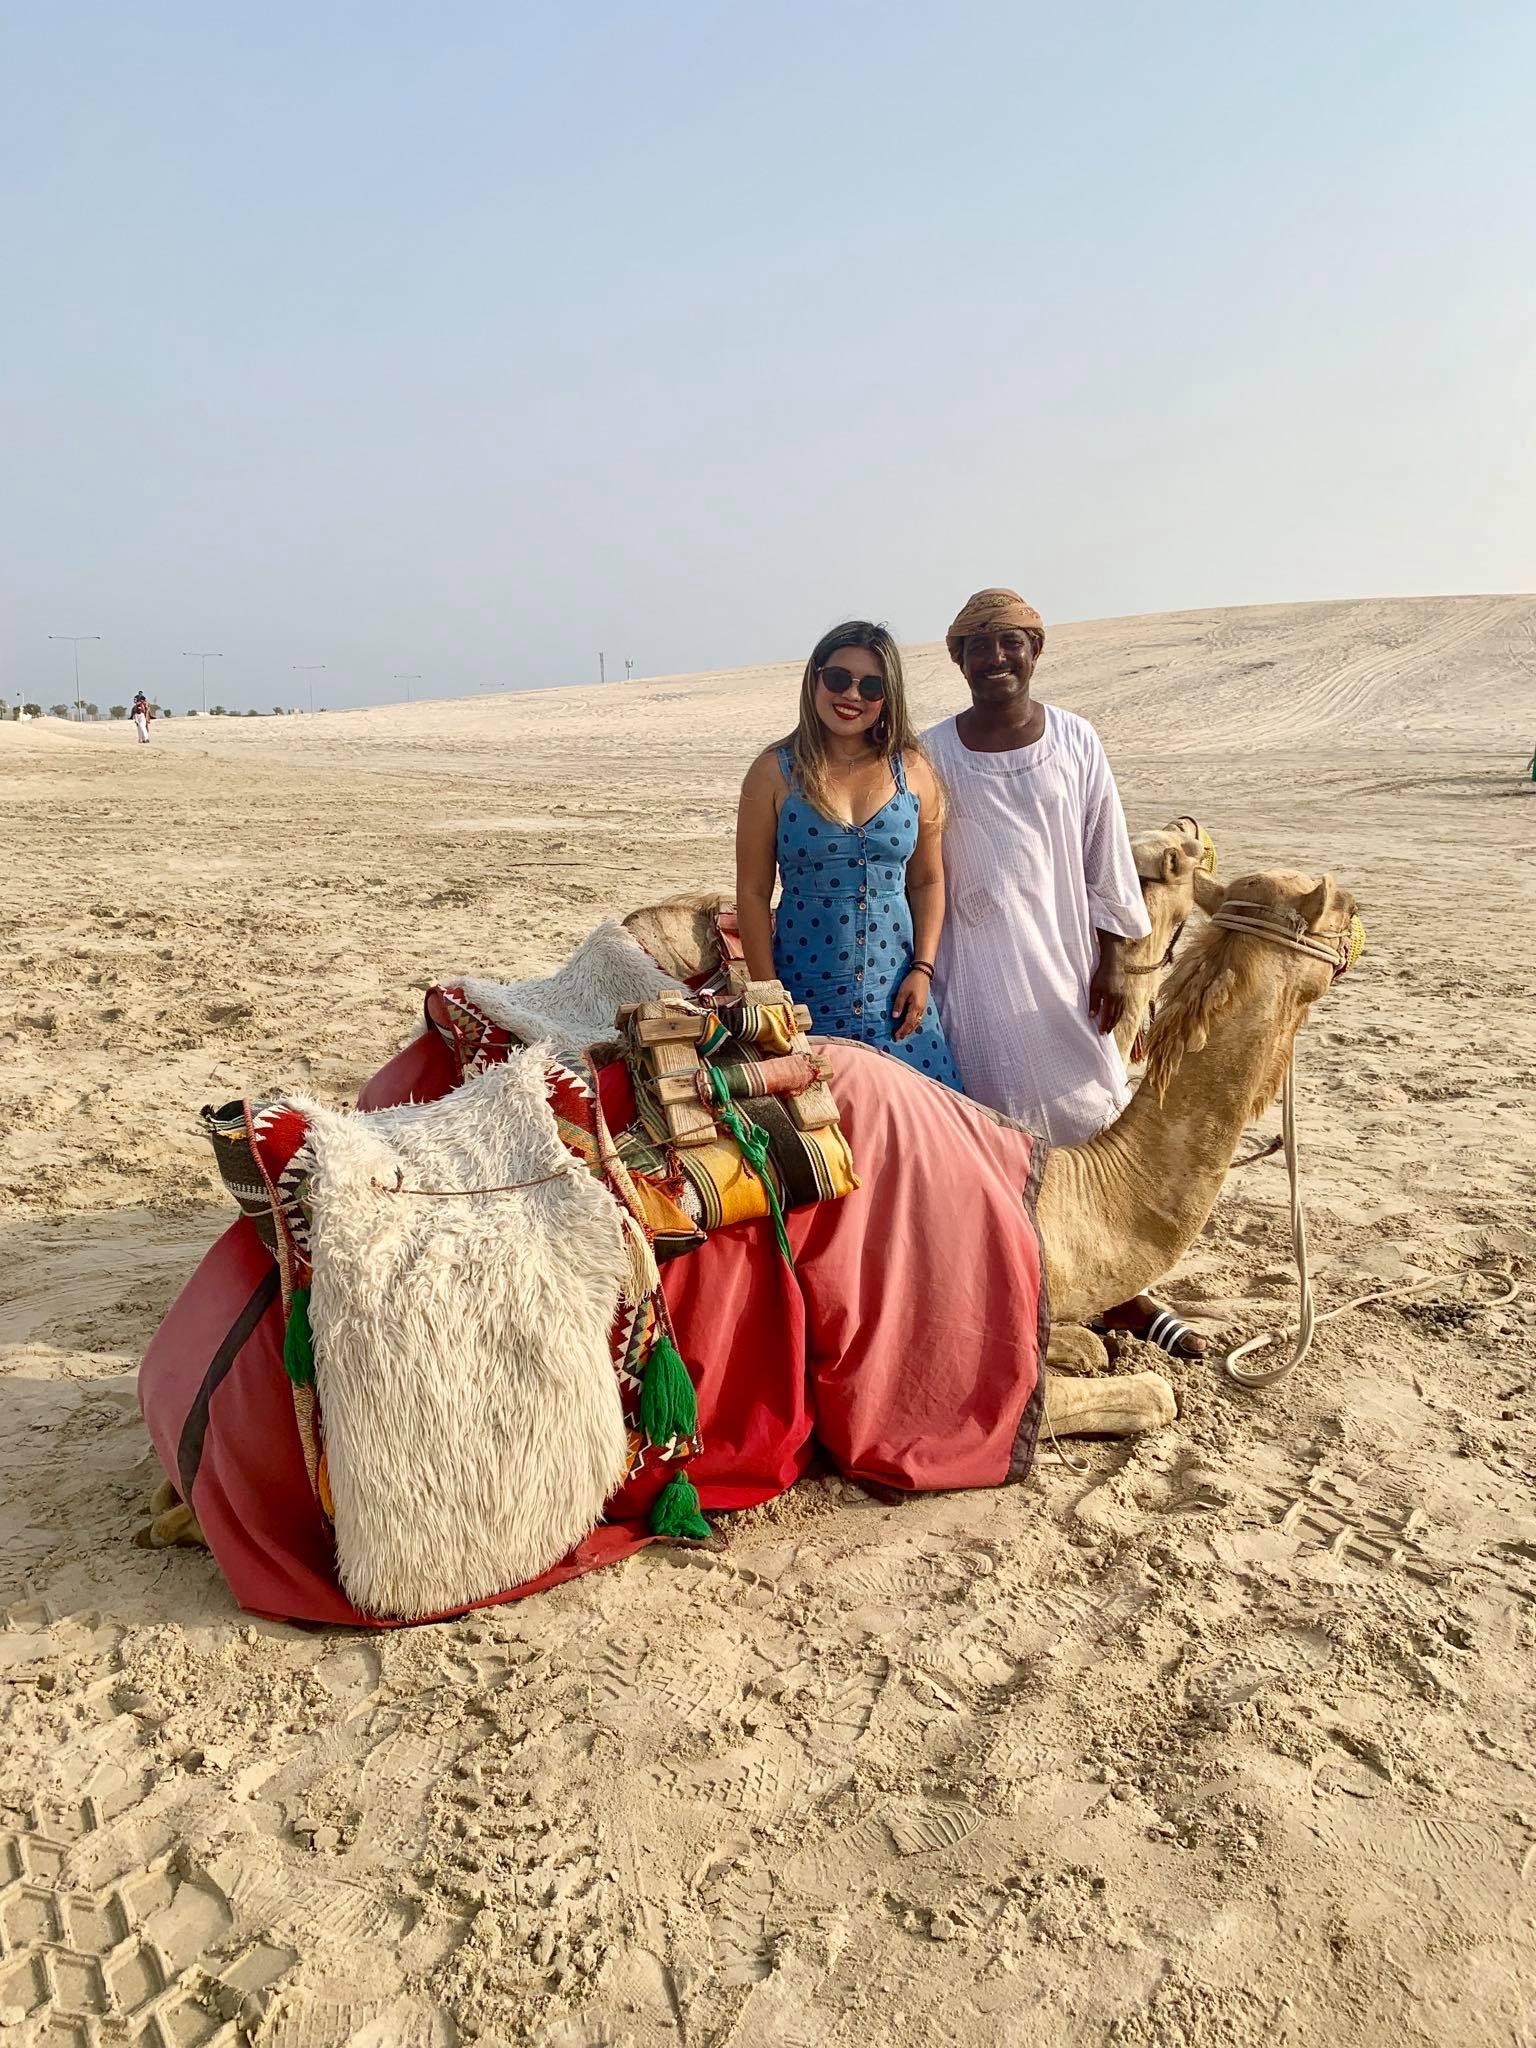 Kach Solo Travels in 2019 I did a 20-hour layover in Doha, QATAR2.jpg